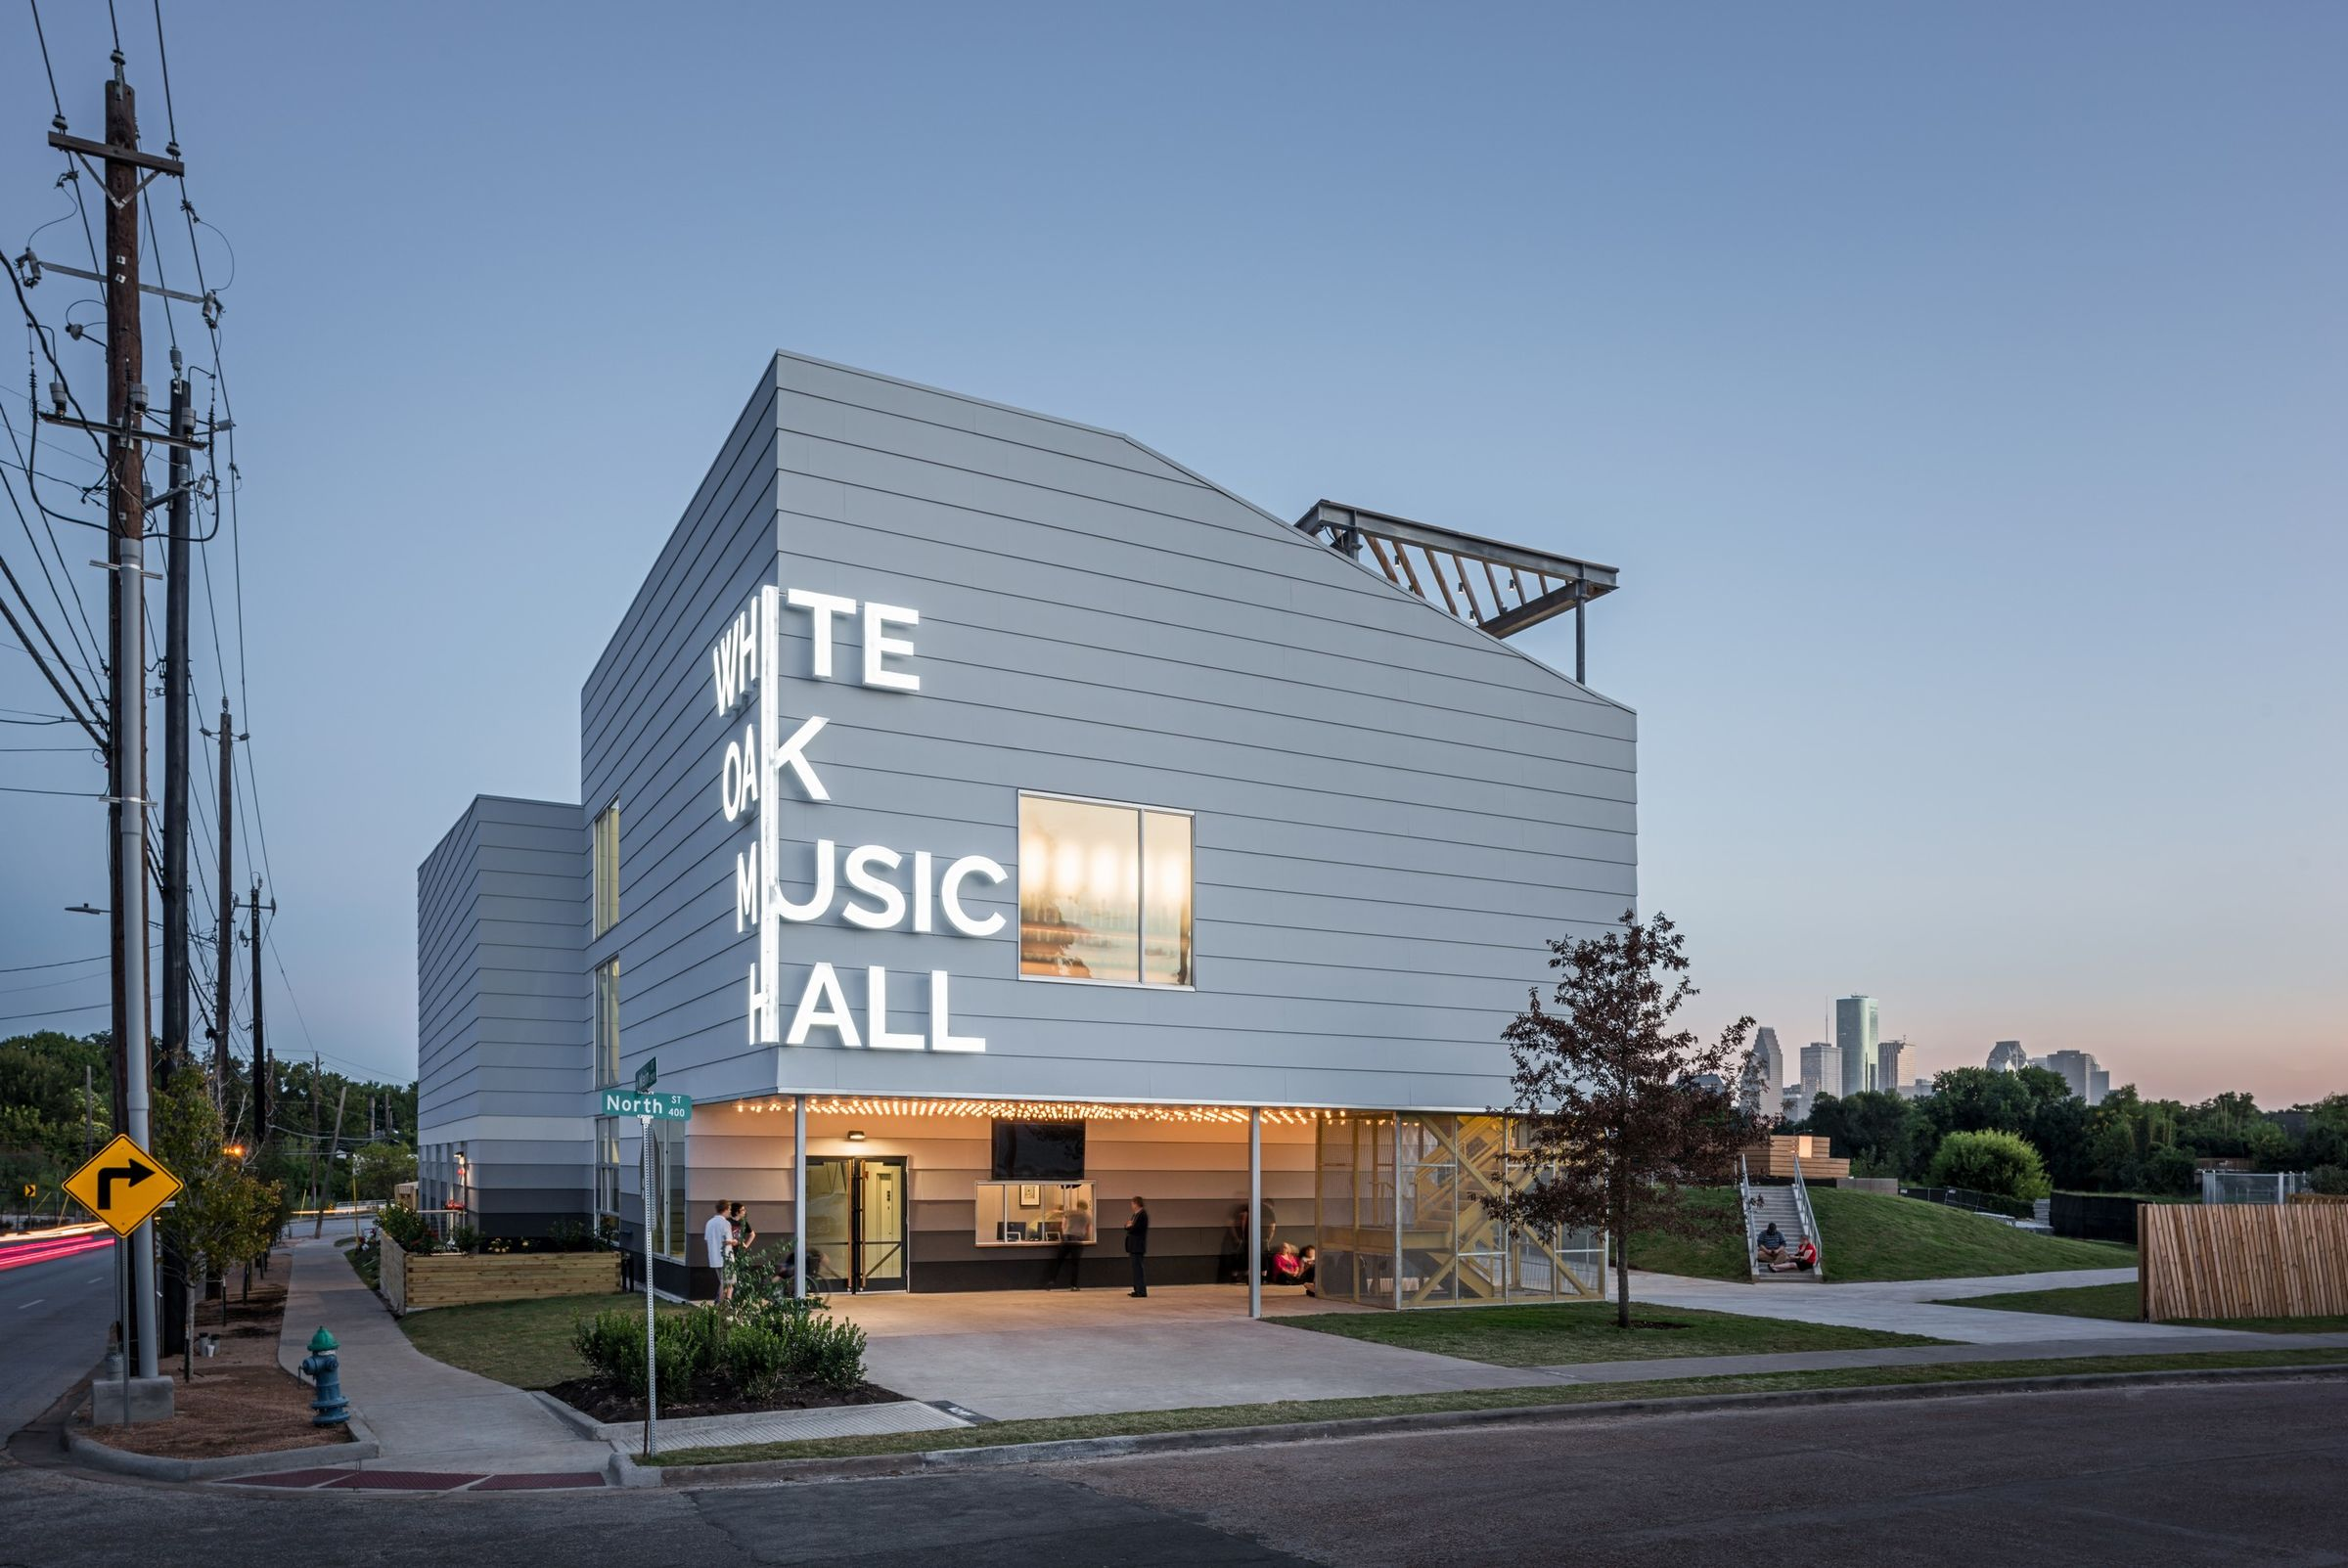 White Oak Music Hall | SCHAUM/SHIEH | Archello